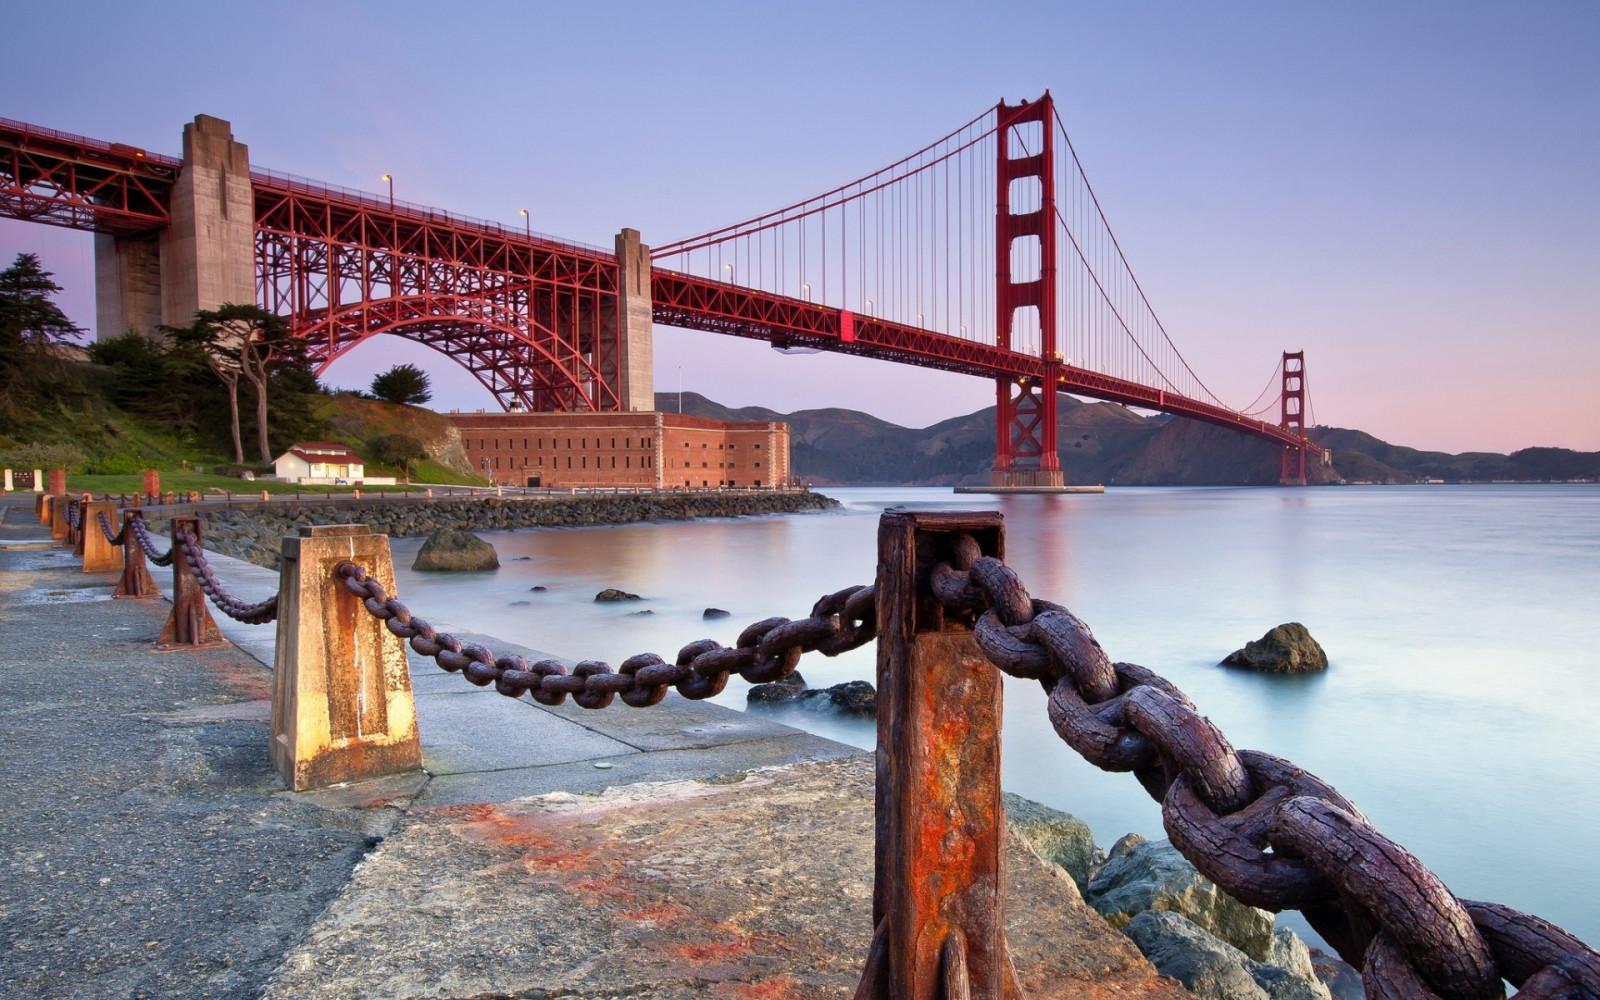 Картинка с мостом сканворд, уразу